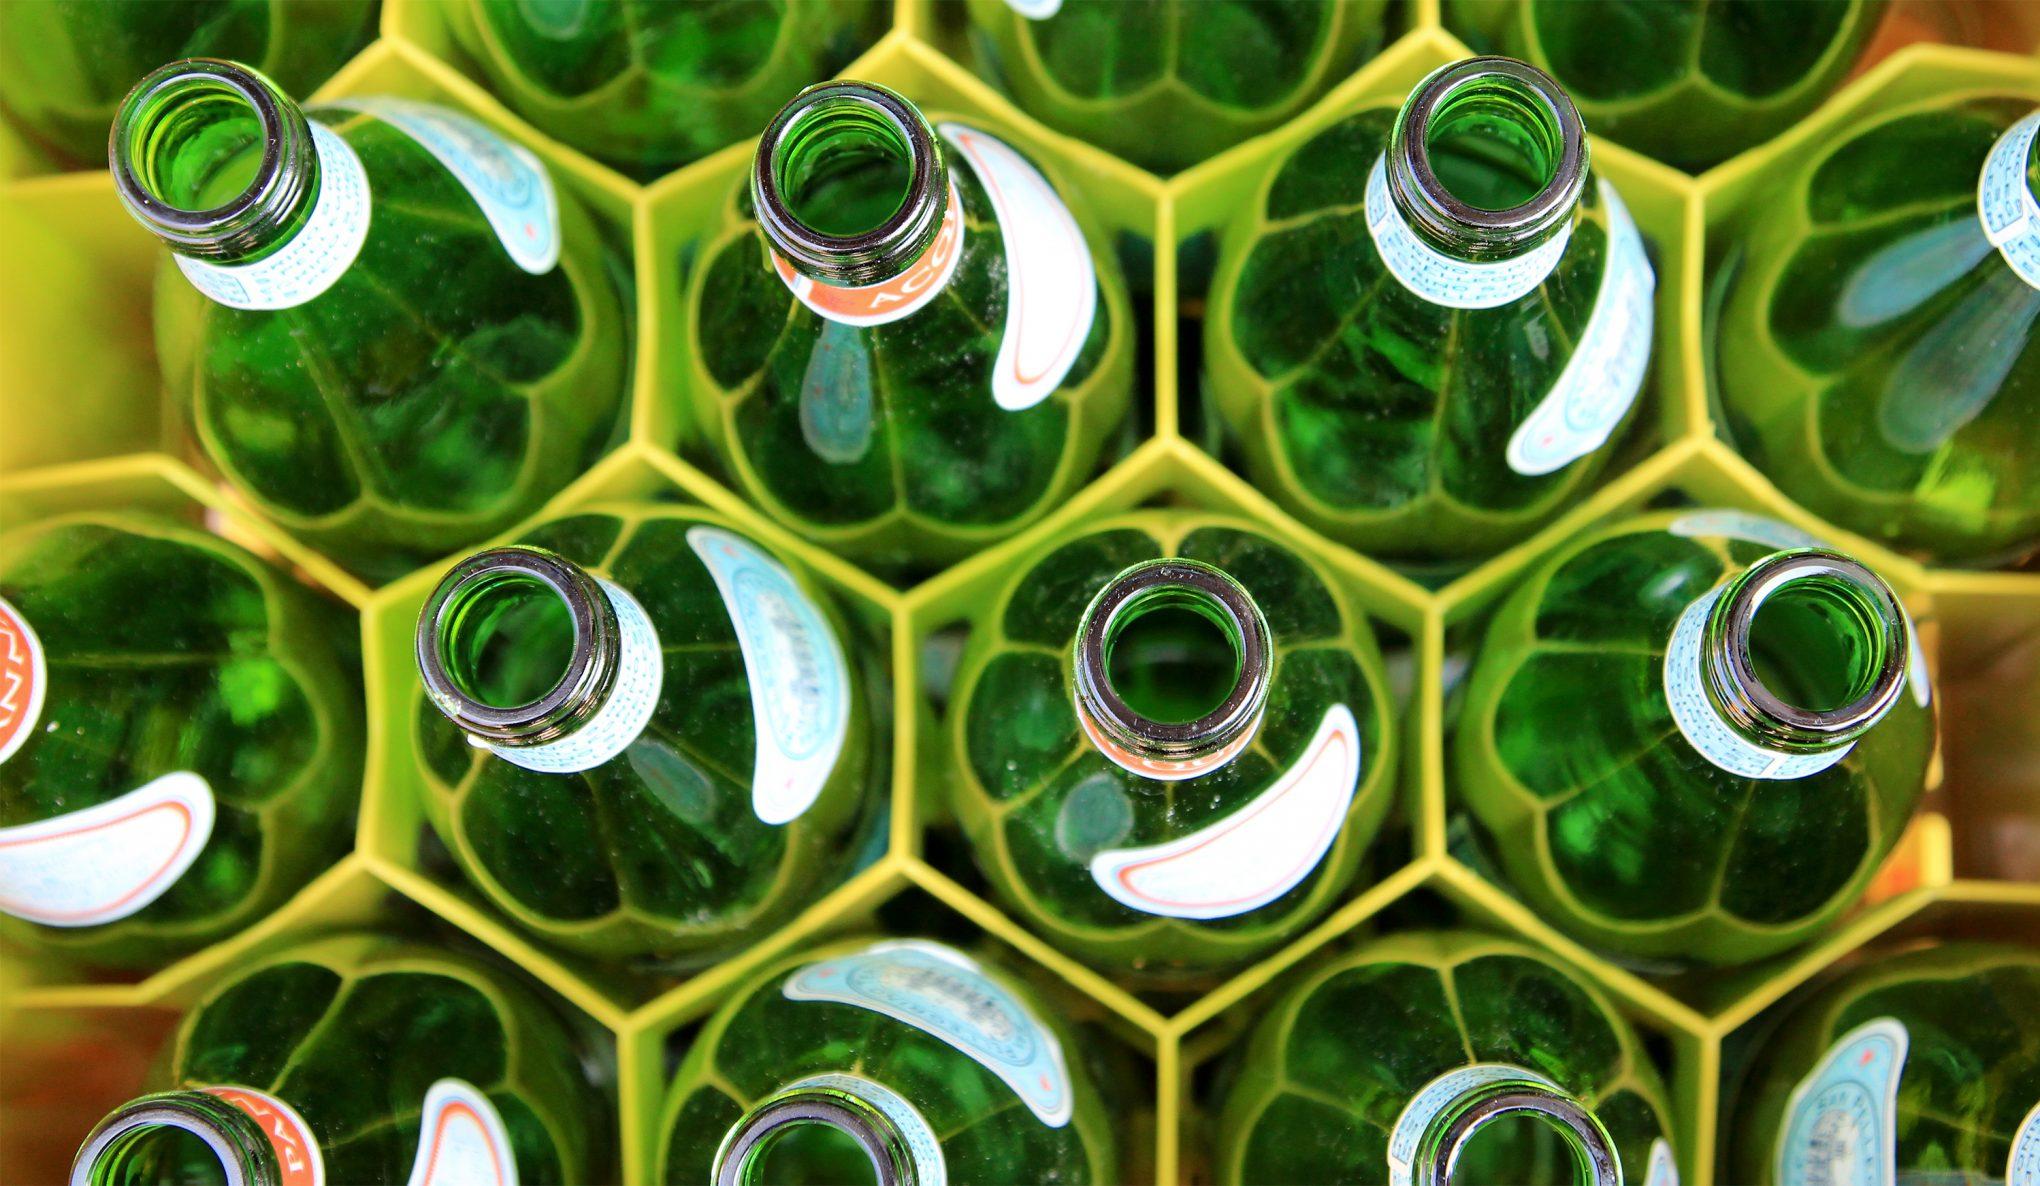 Circular economy: closing the circle